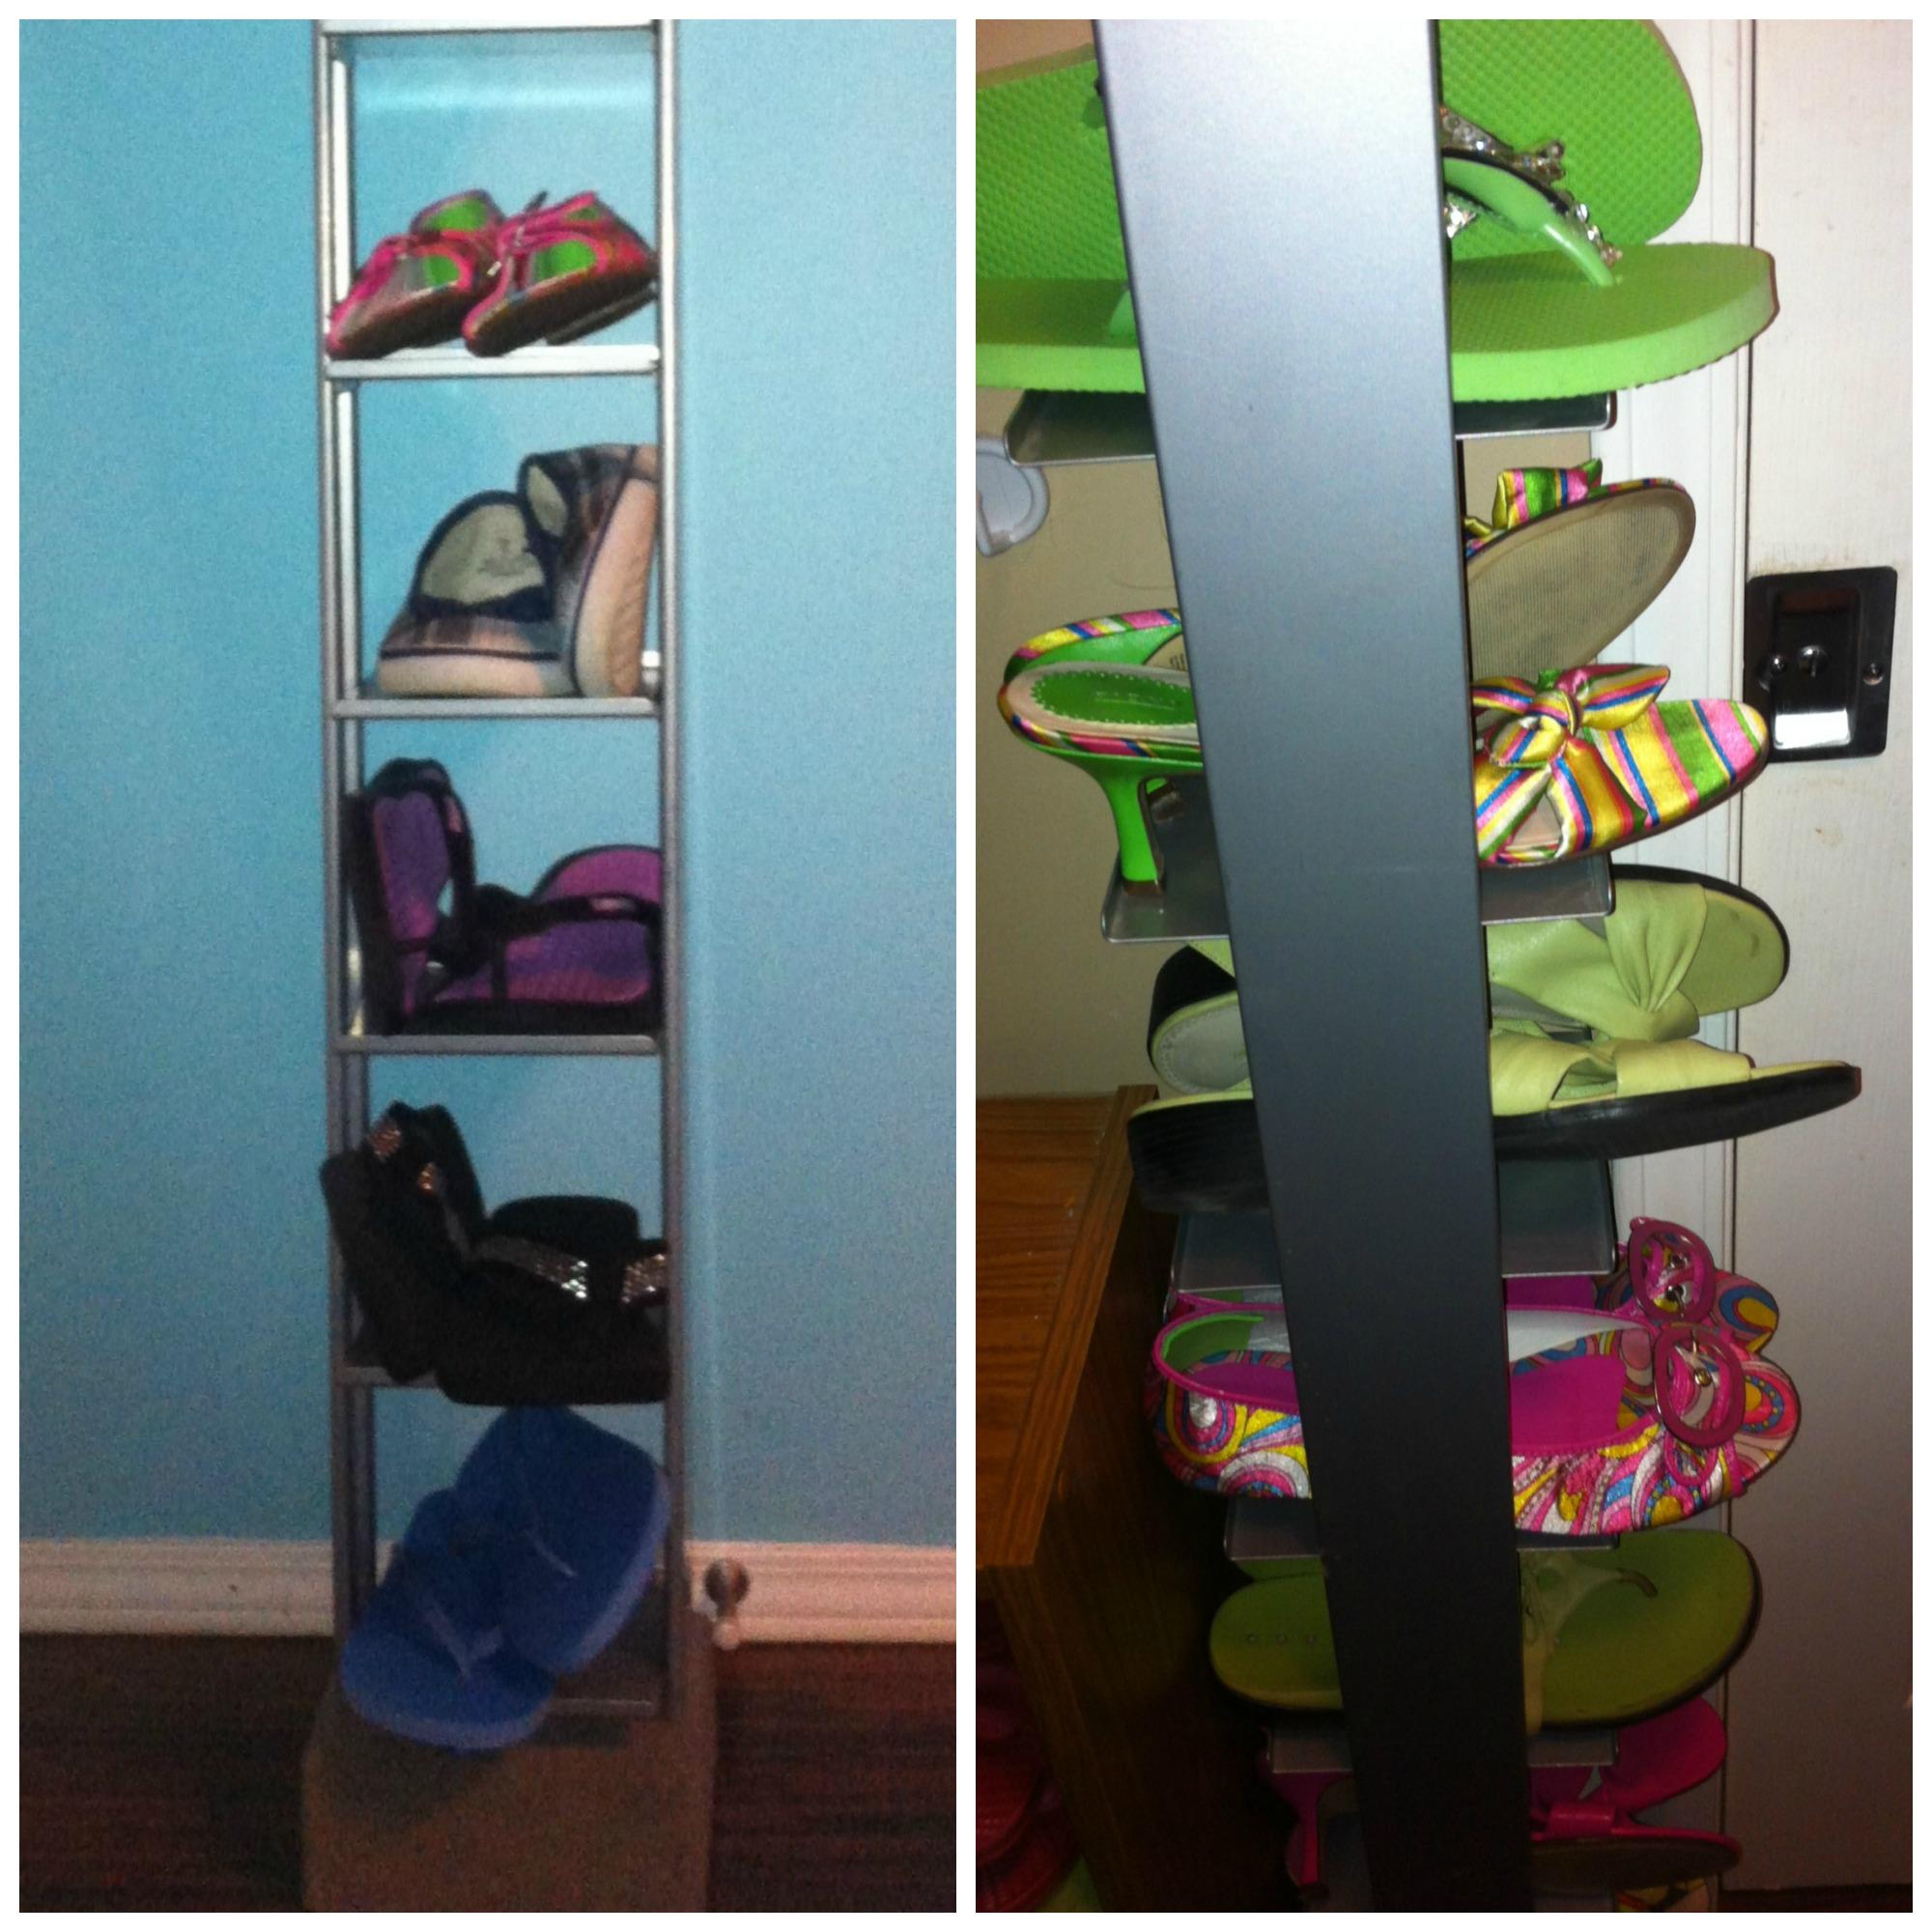 CD Tower Turned High Rise Shoe Rack